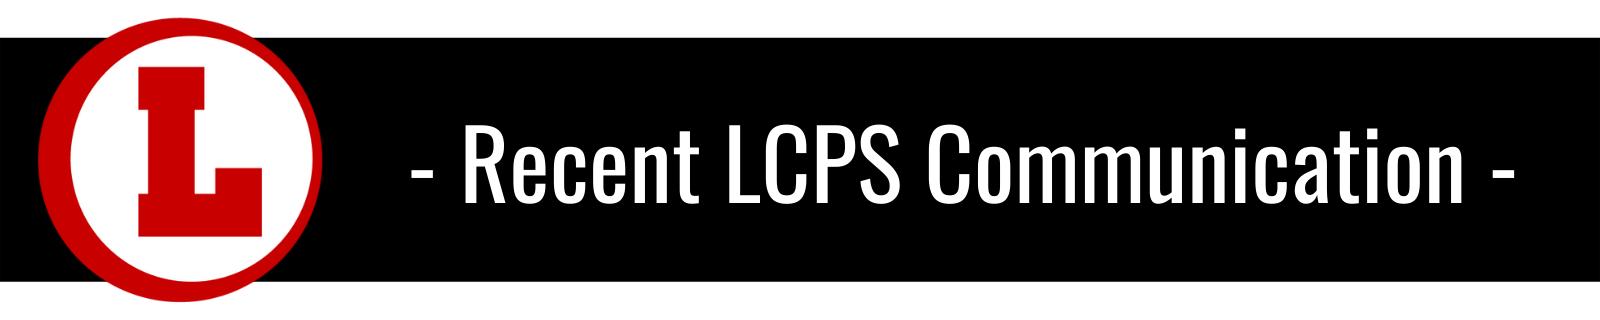 Recent LCPS Communication